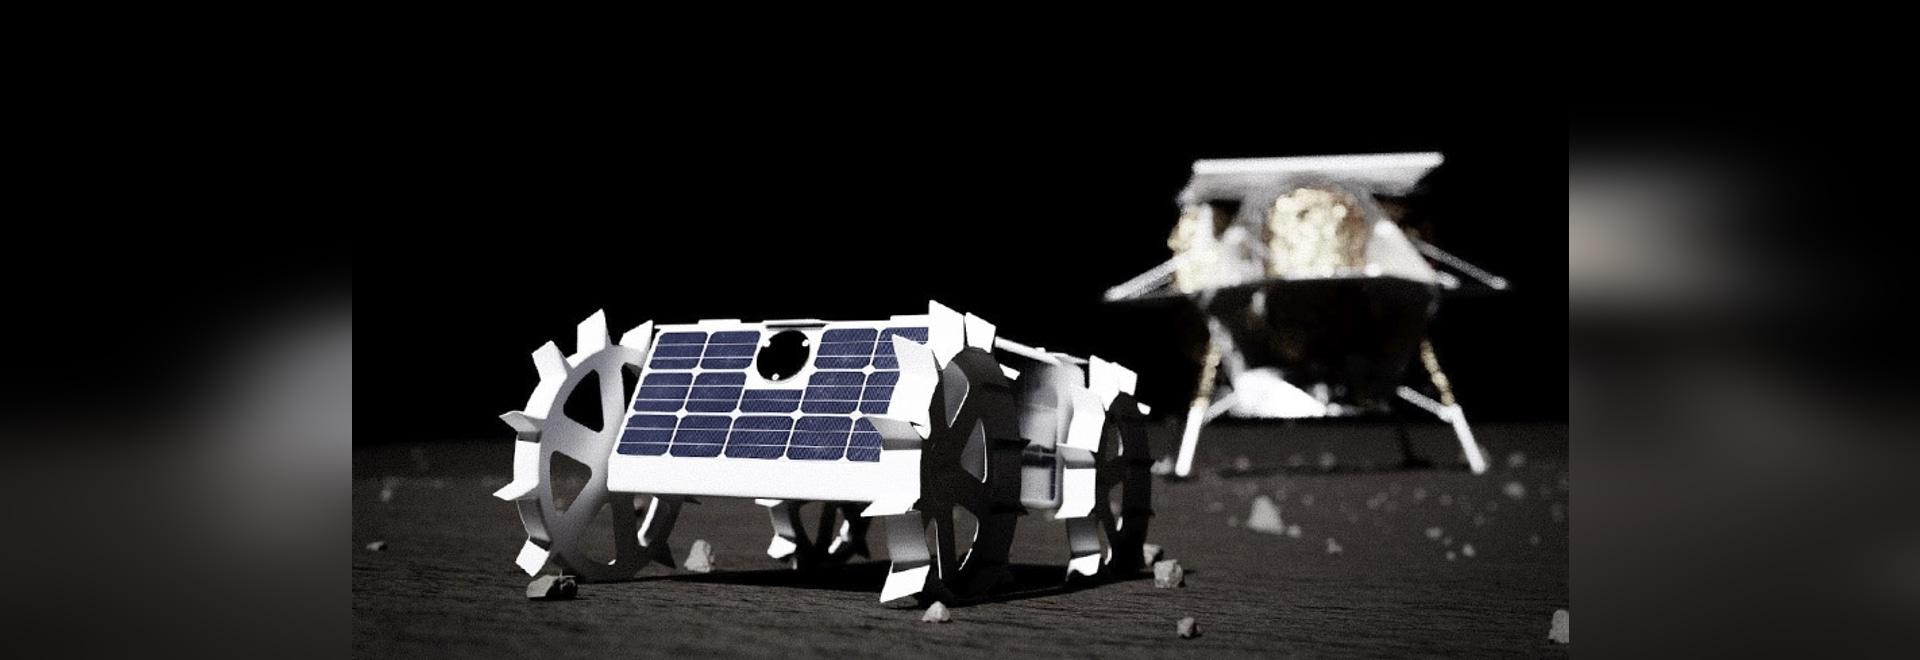 Carnegie Mellon Robot, Art Project To Land on Moon en 2021